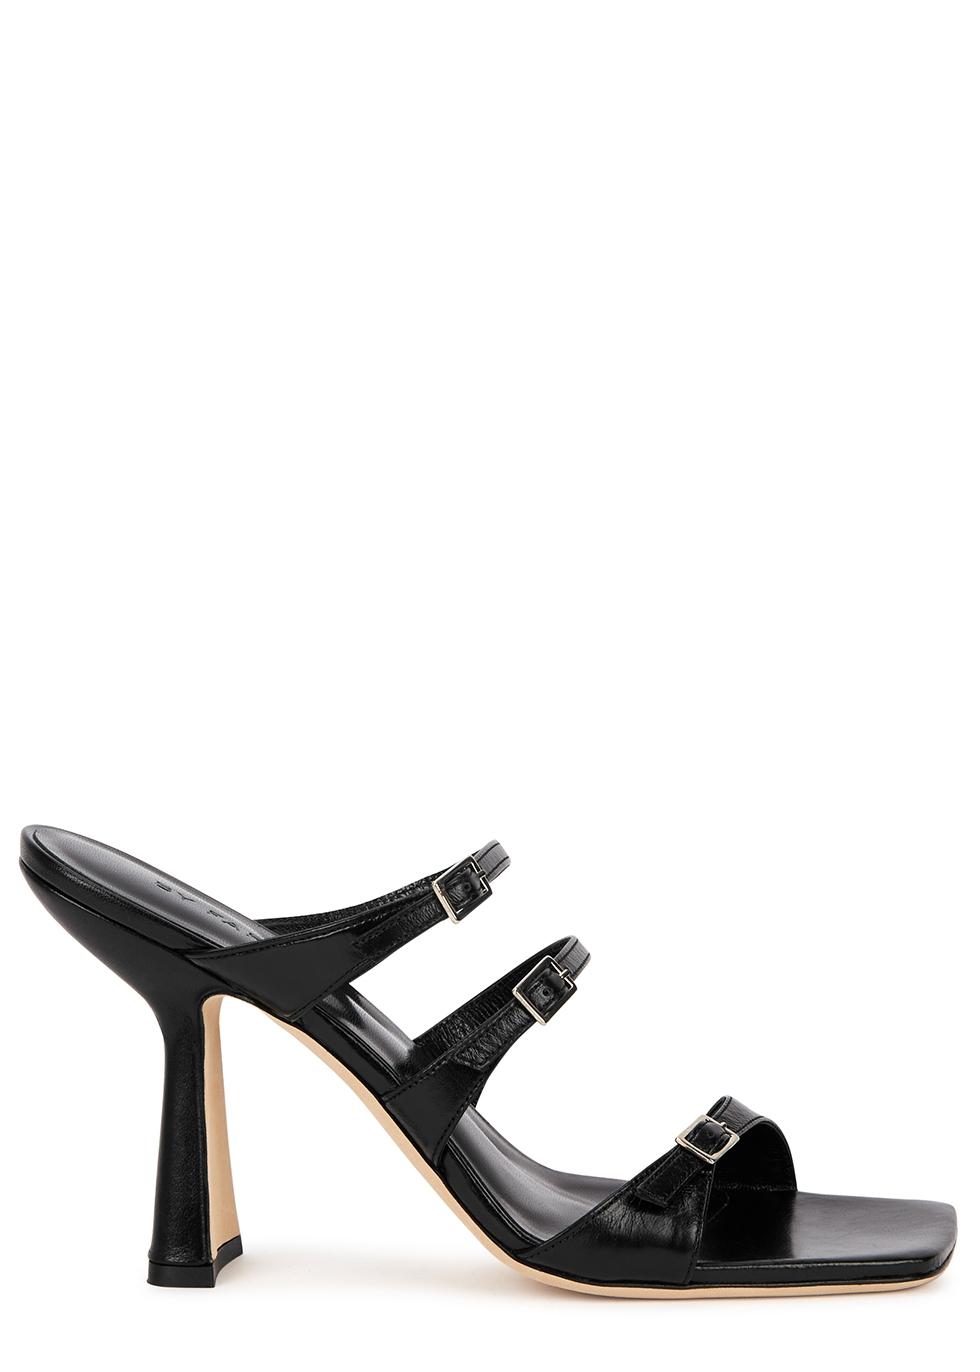 Malene 100 black leather sandals